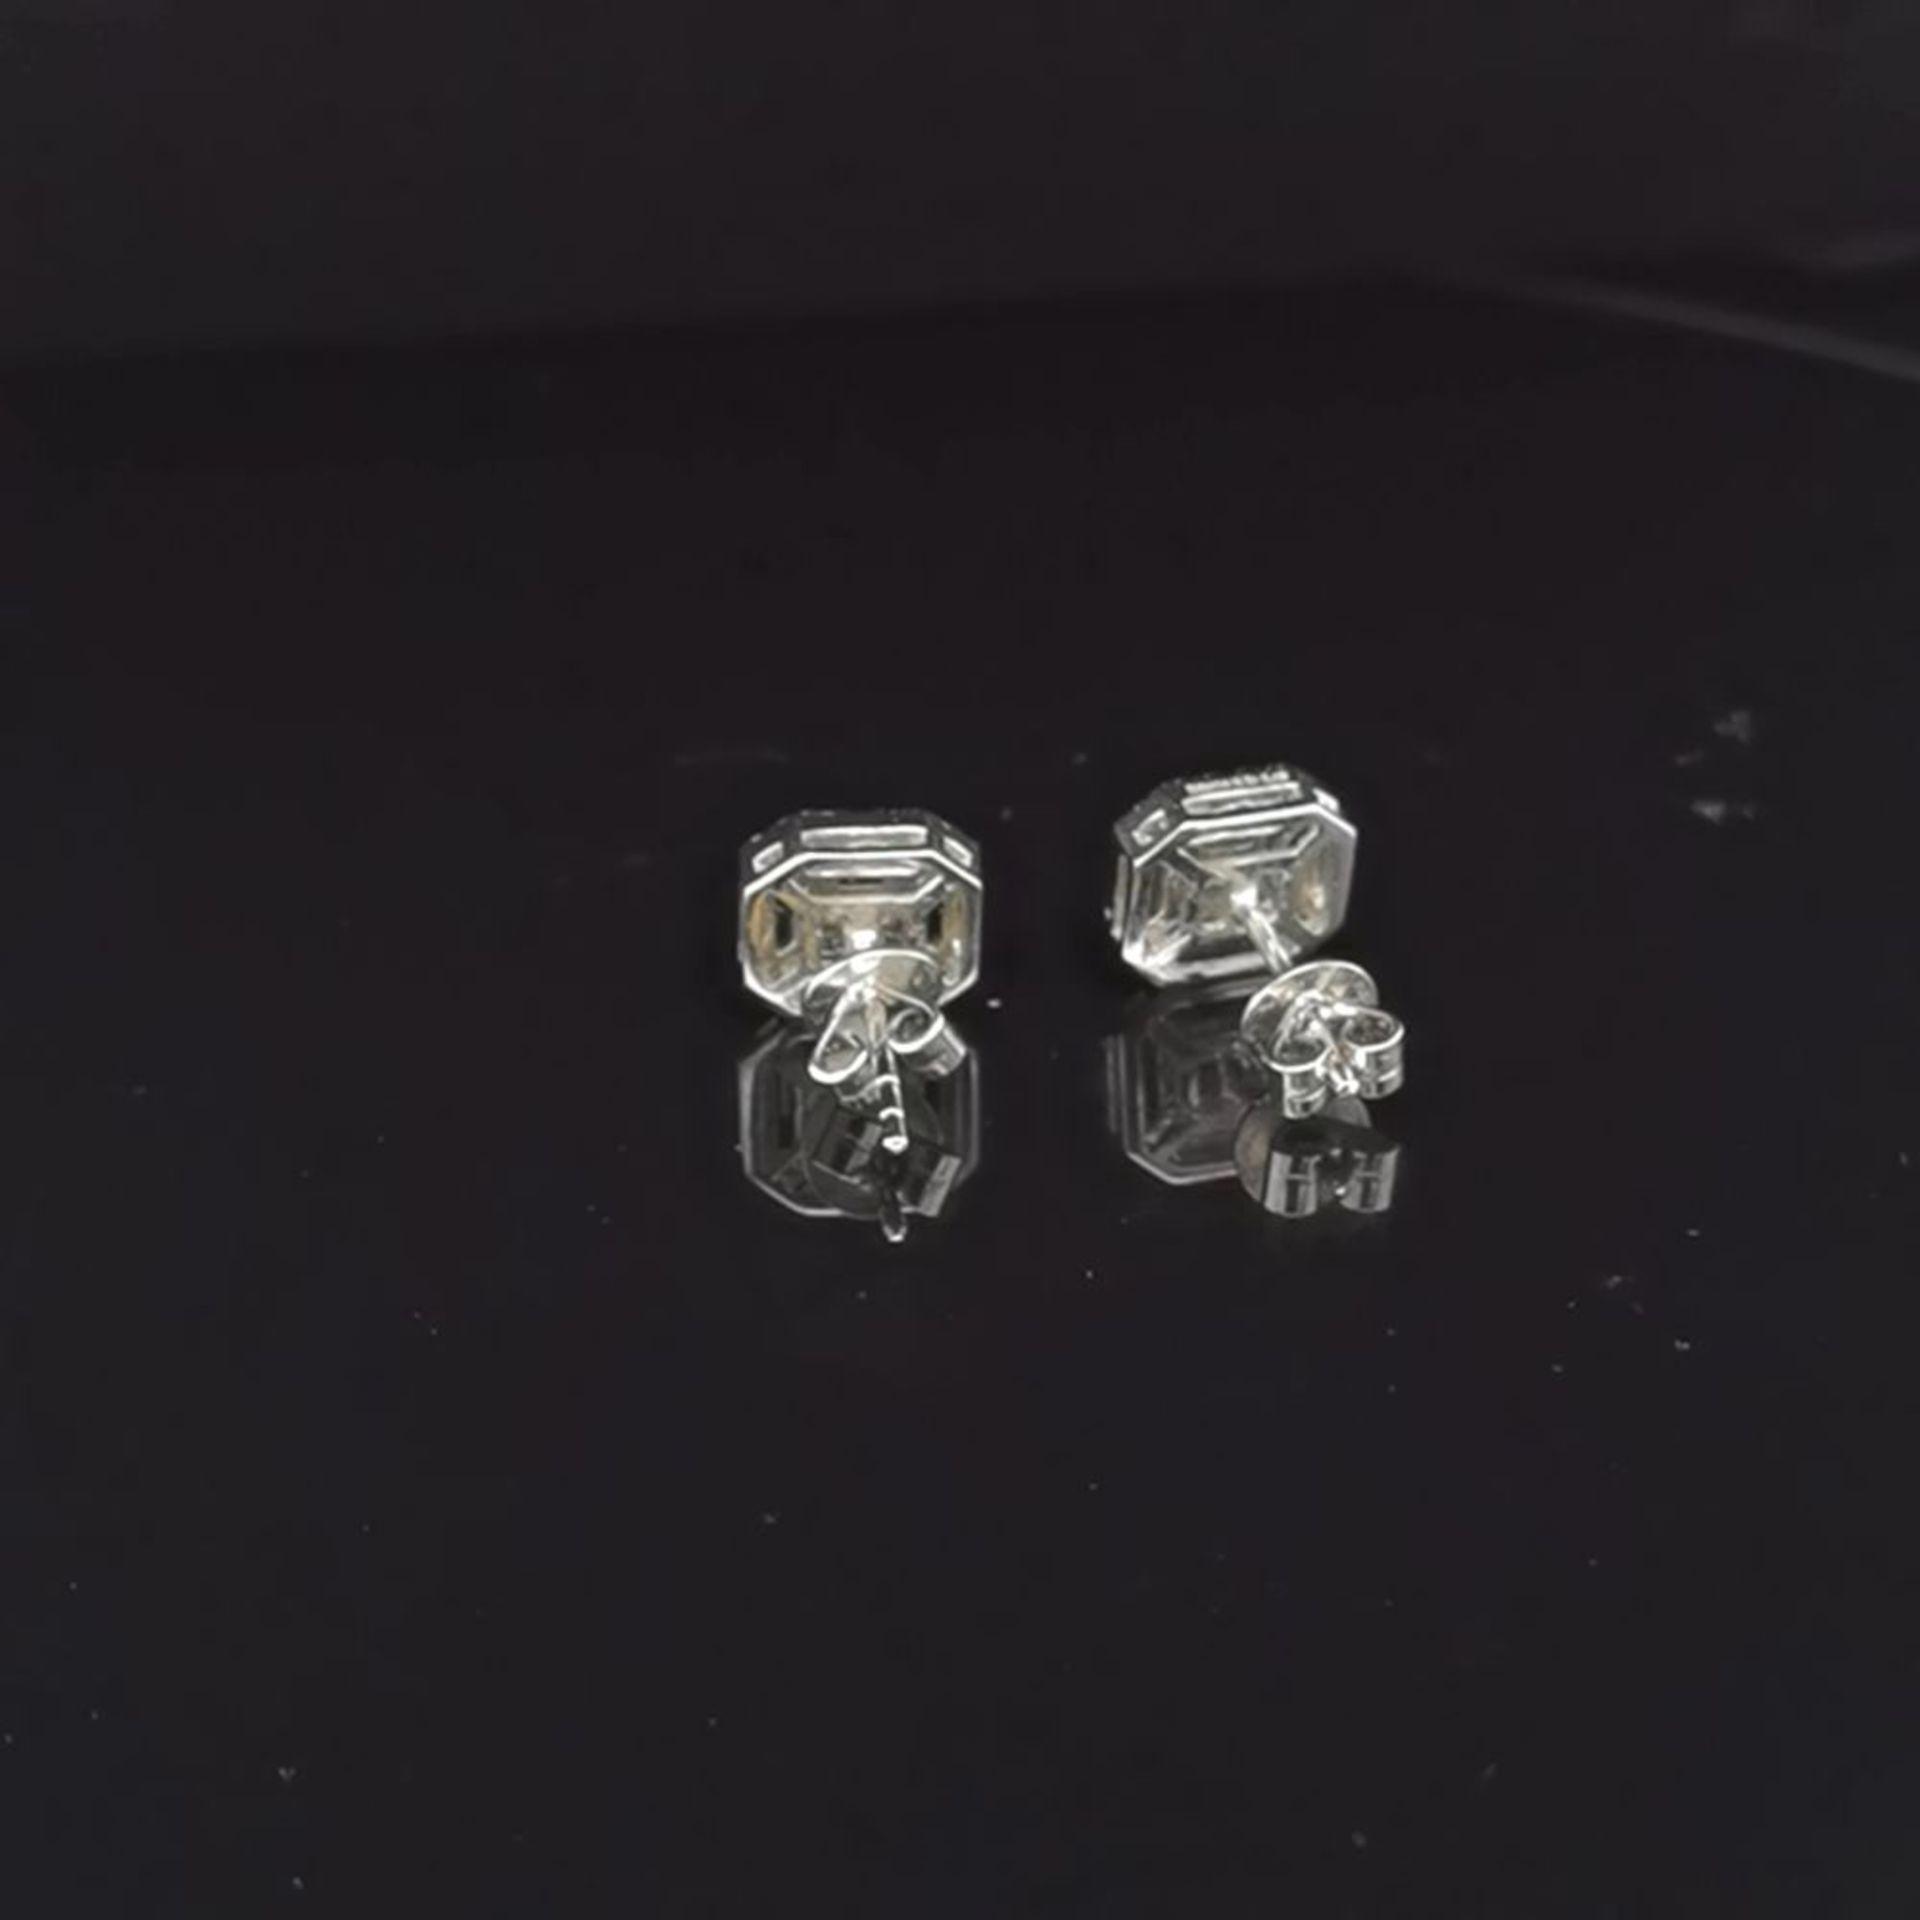 Diamant-Brillant-Ohrstecker, 585 - Image 3 of 3